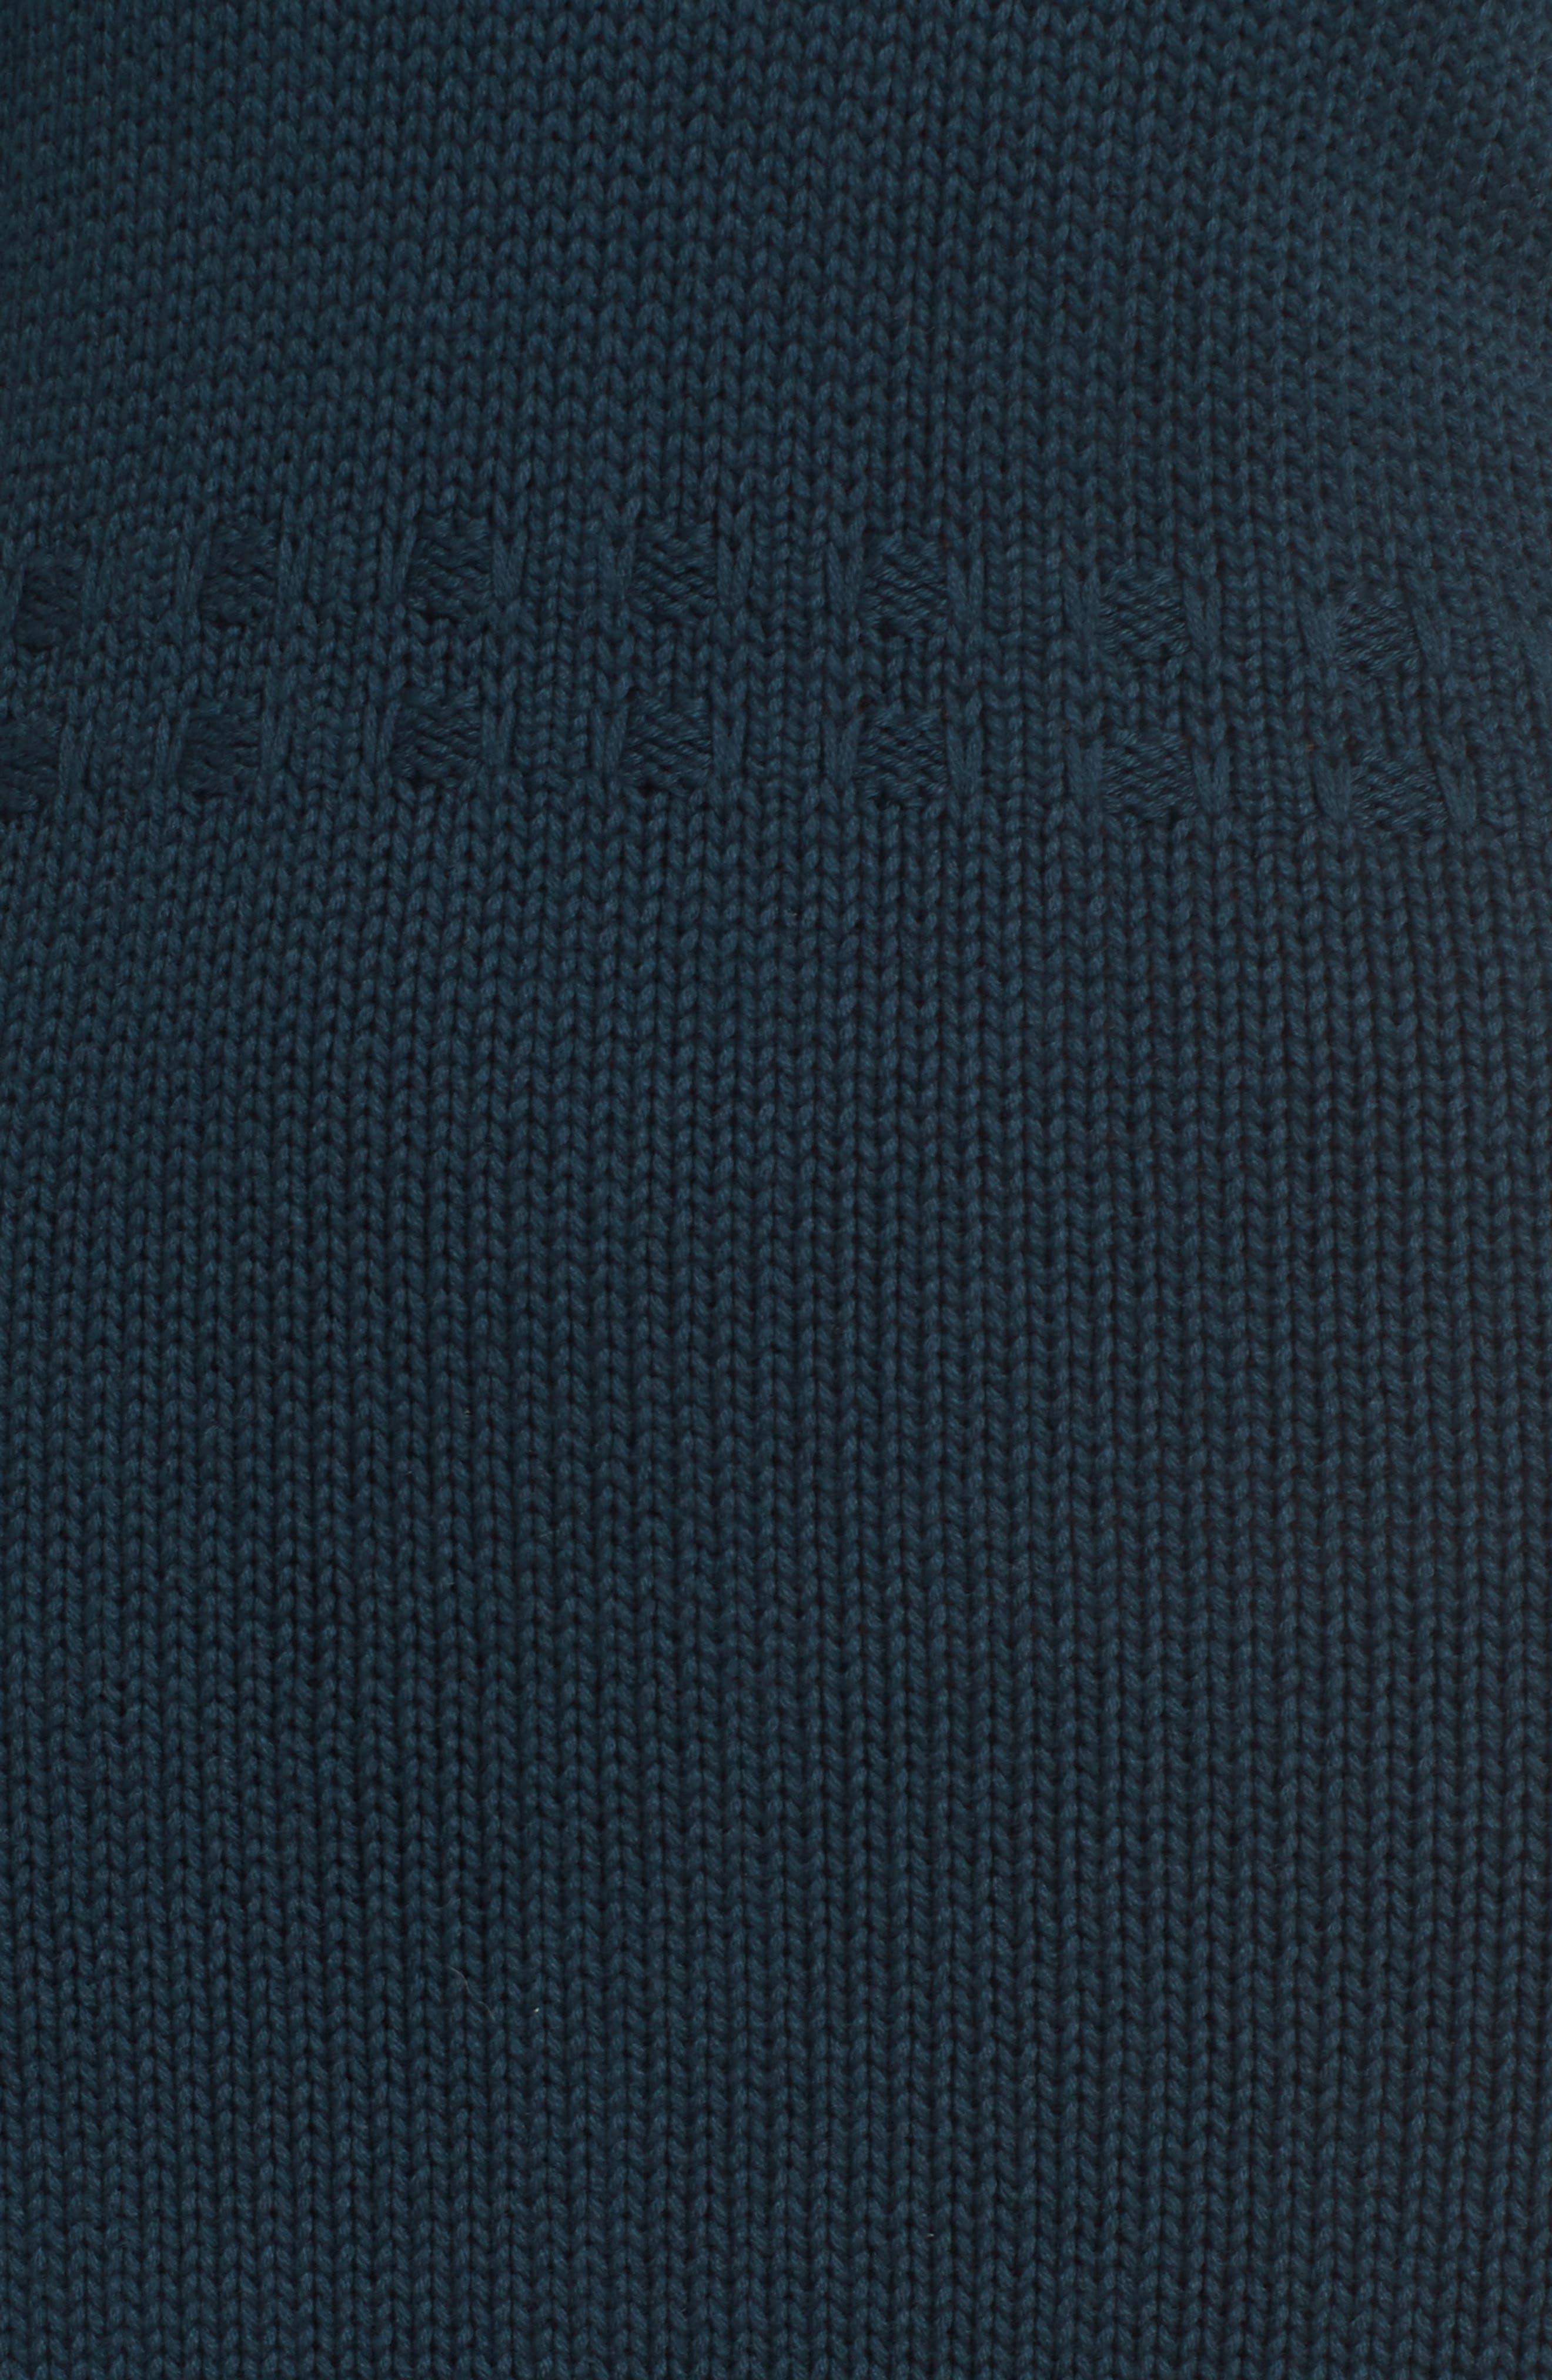 Falling Free Knit Off the Shoulder Dress,                             Alternate thumbnail 5, color,                             430